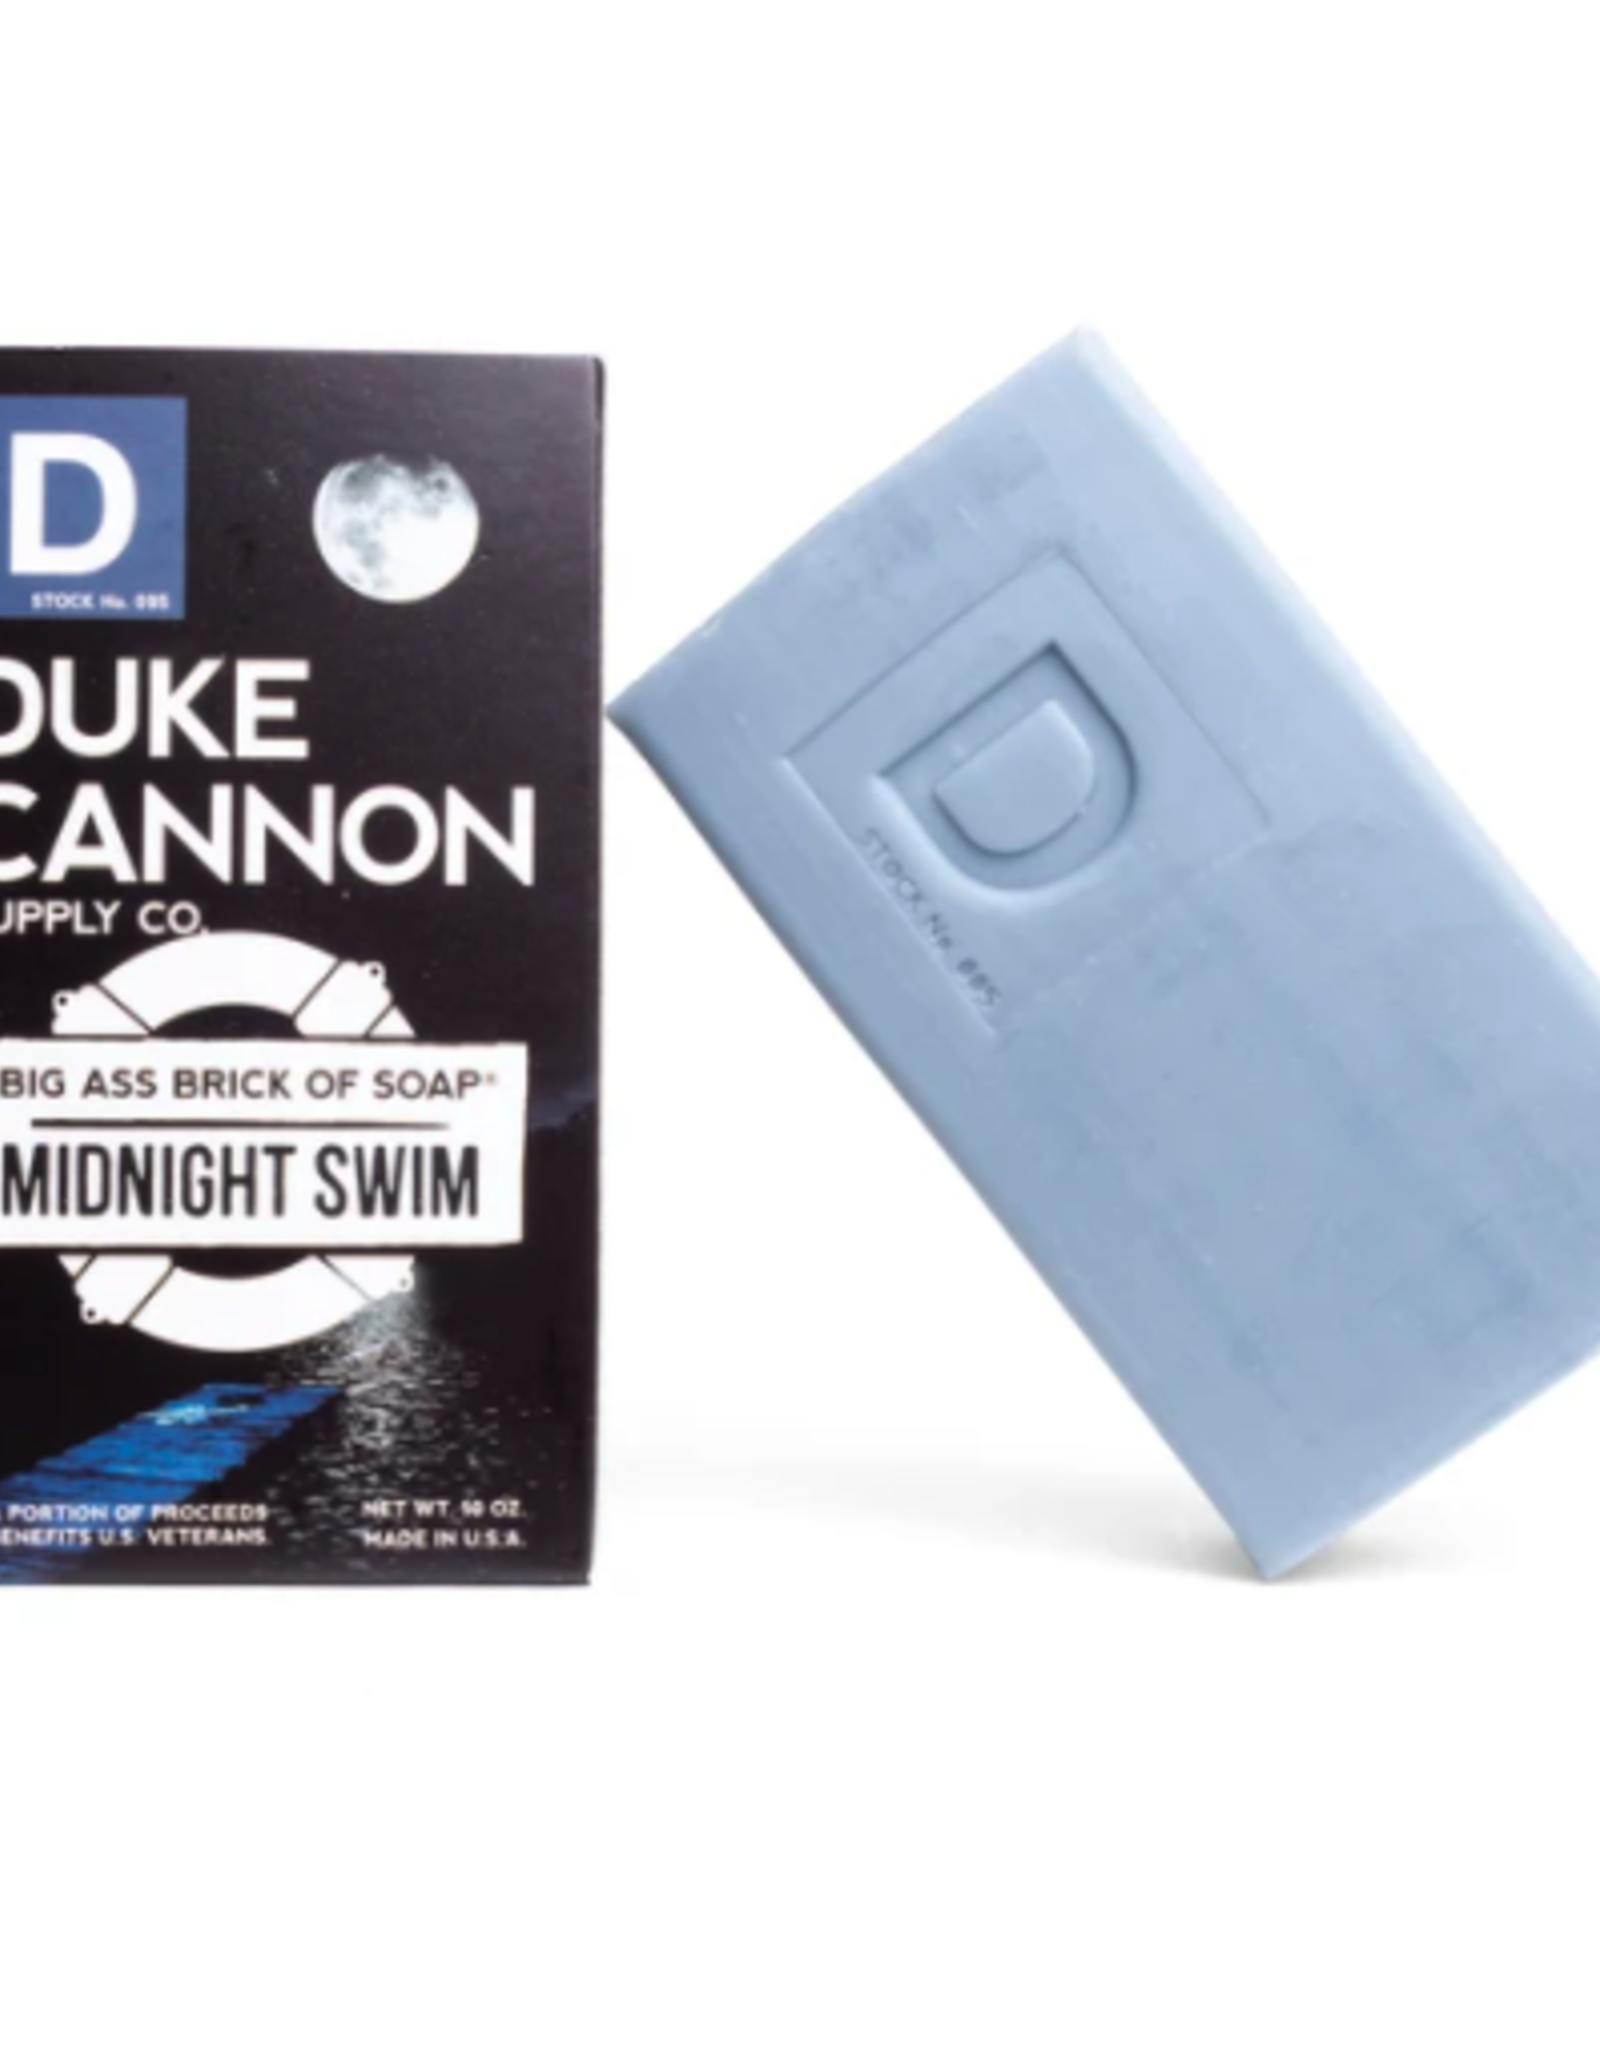 Duke Cannon Duke Cannon - Big Bar Of Soap Midnight Swim